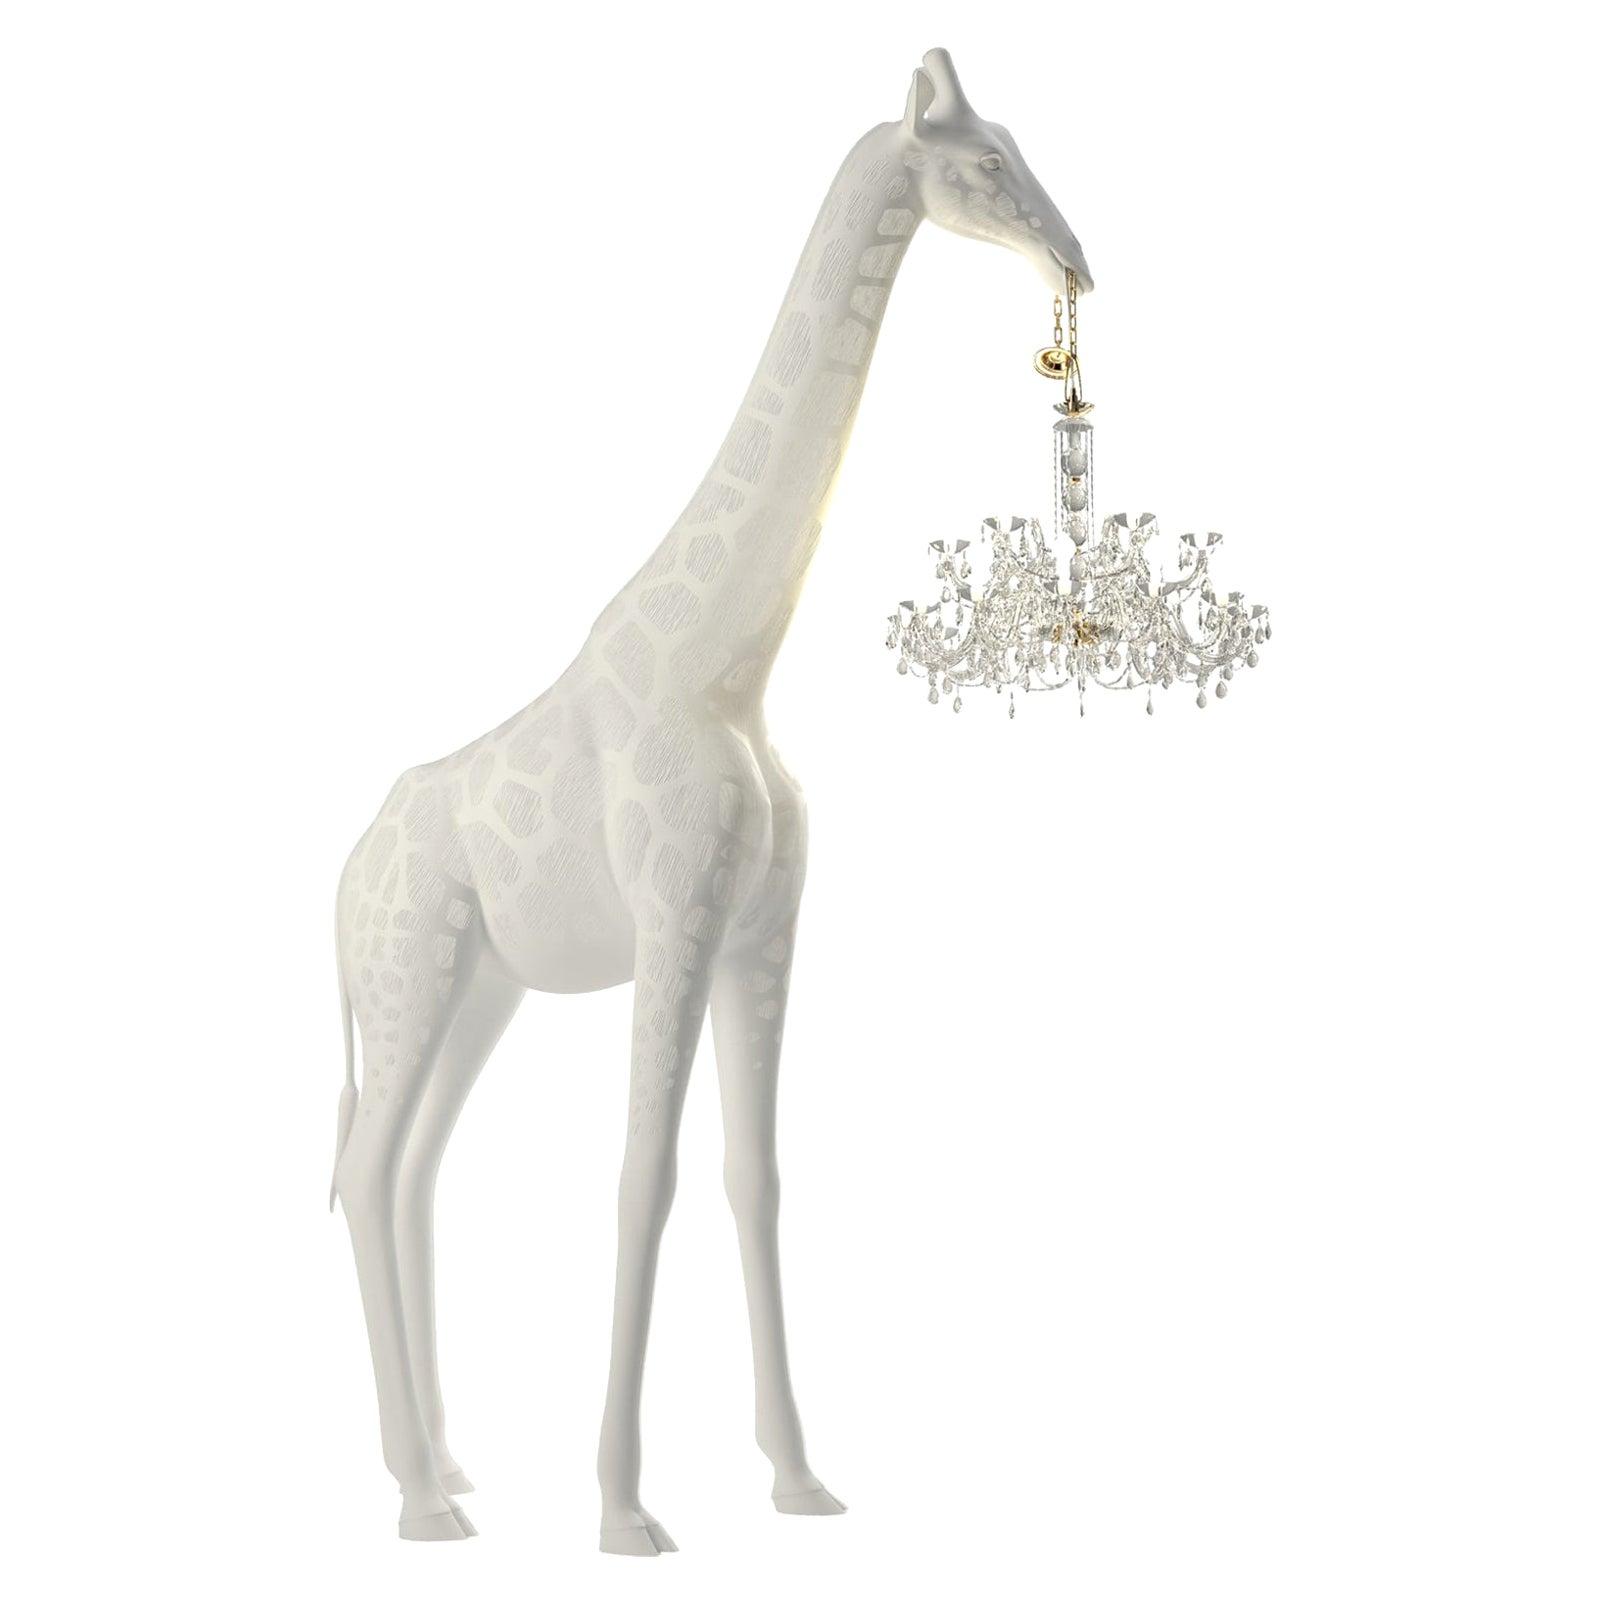 13 Feet Tall, White Giraffe Indoor Chandelier, Designed by Marcantonio